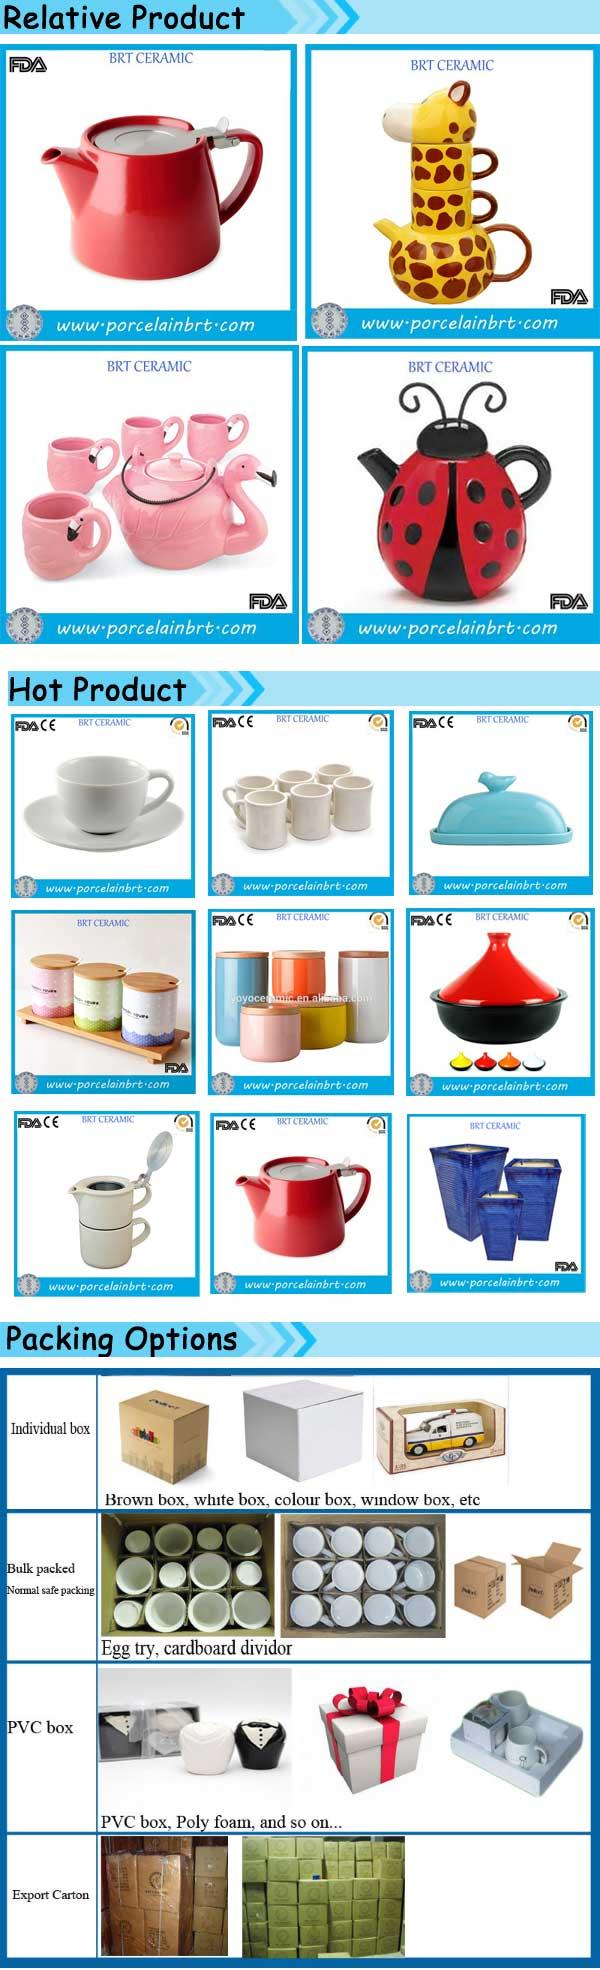 Home Appliance Bee Shaped Cheap Ceramic Teapot